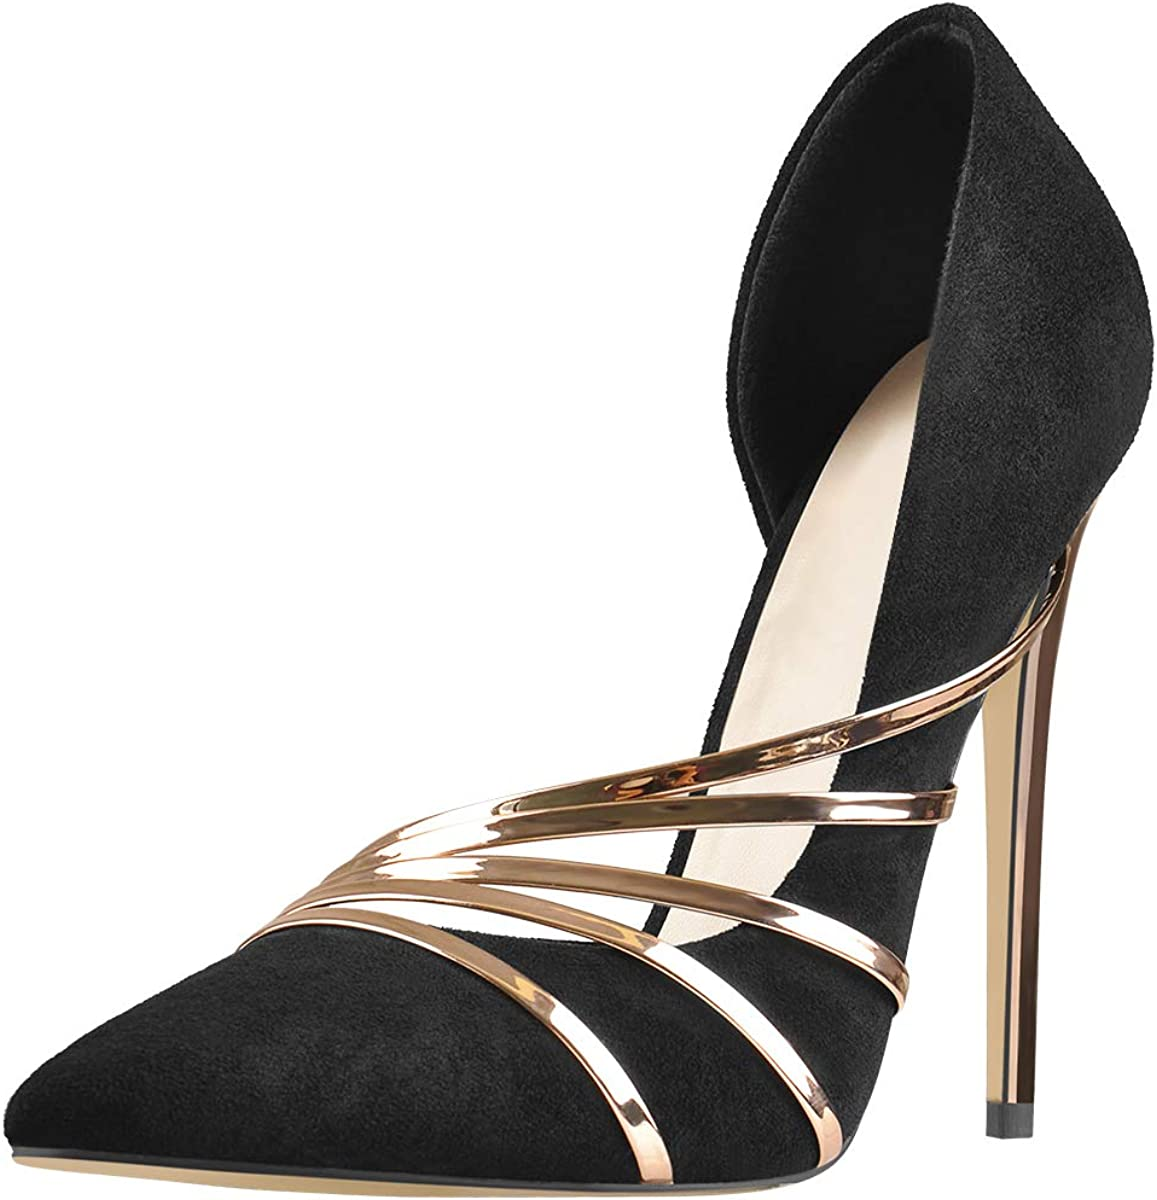 Richealnana Women's Pointed Toe Stiletto Heel Pumps Shoes